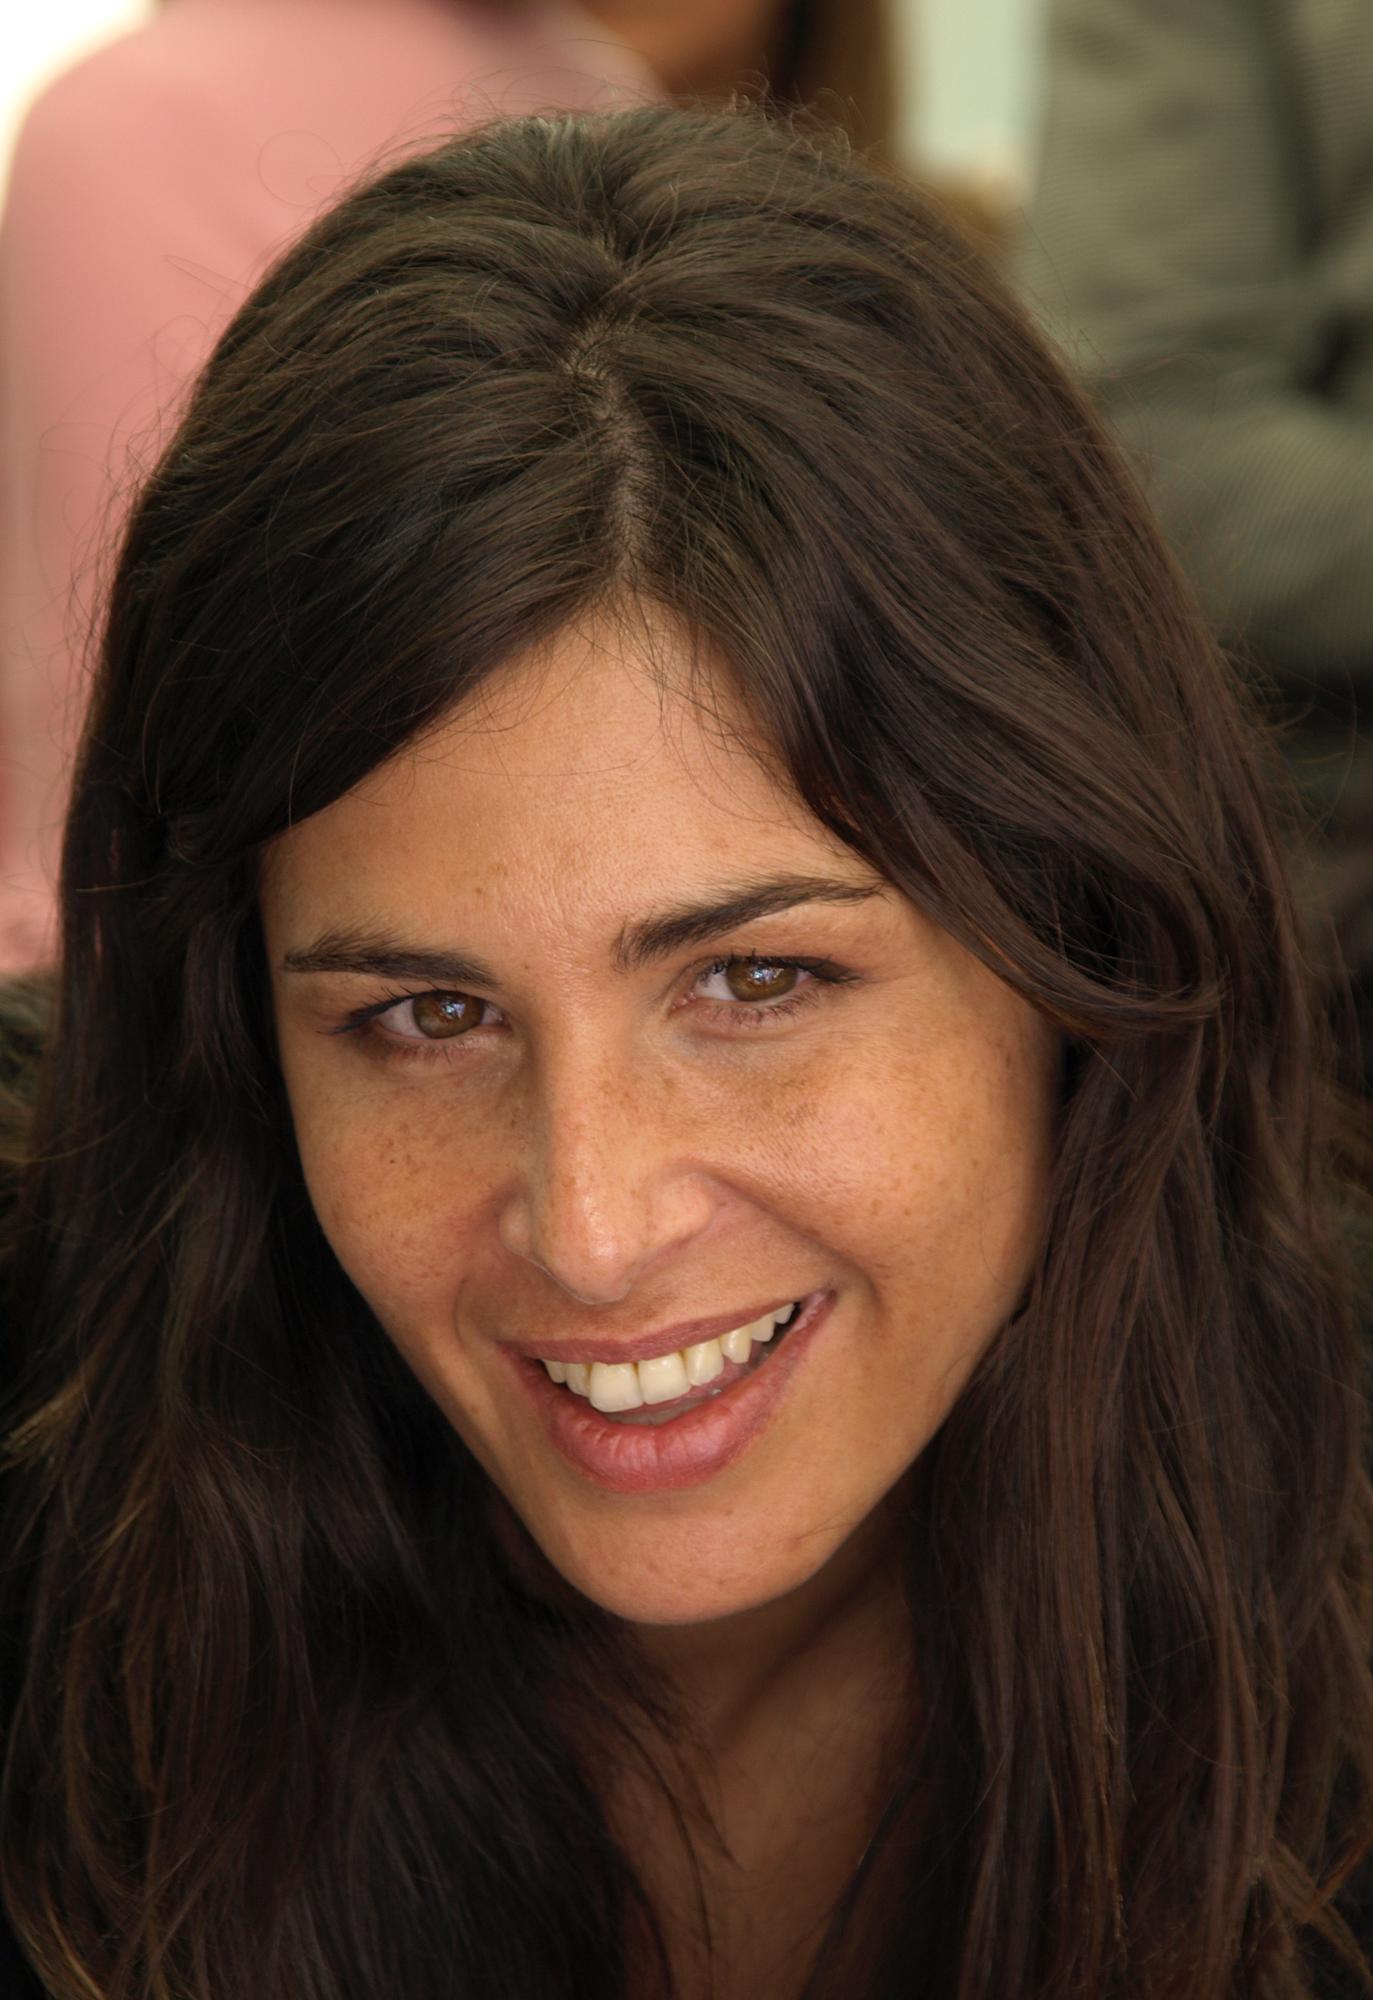 Nuria Roca in April 2008